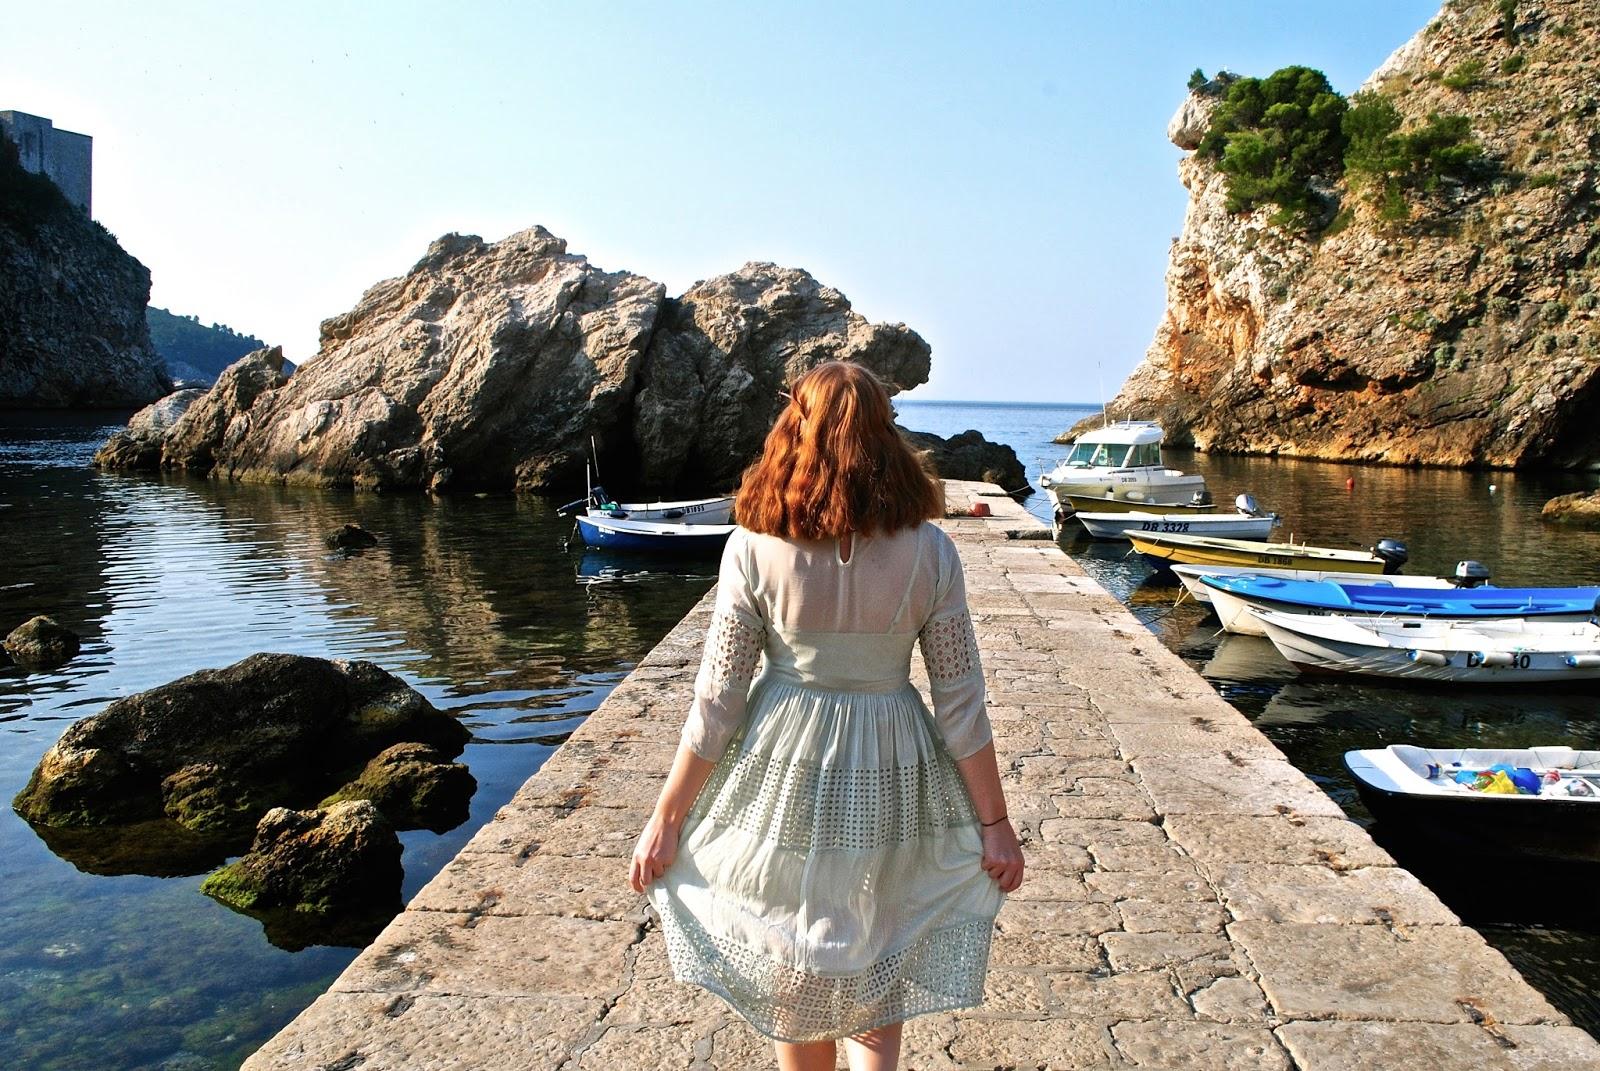 Game of Thrones Filming Location in Dubrovnik - Pier next to Fort Lovrijenac